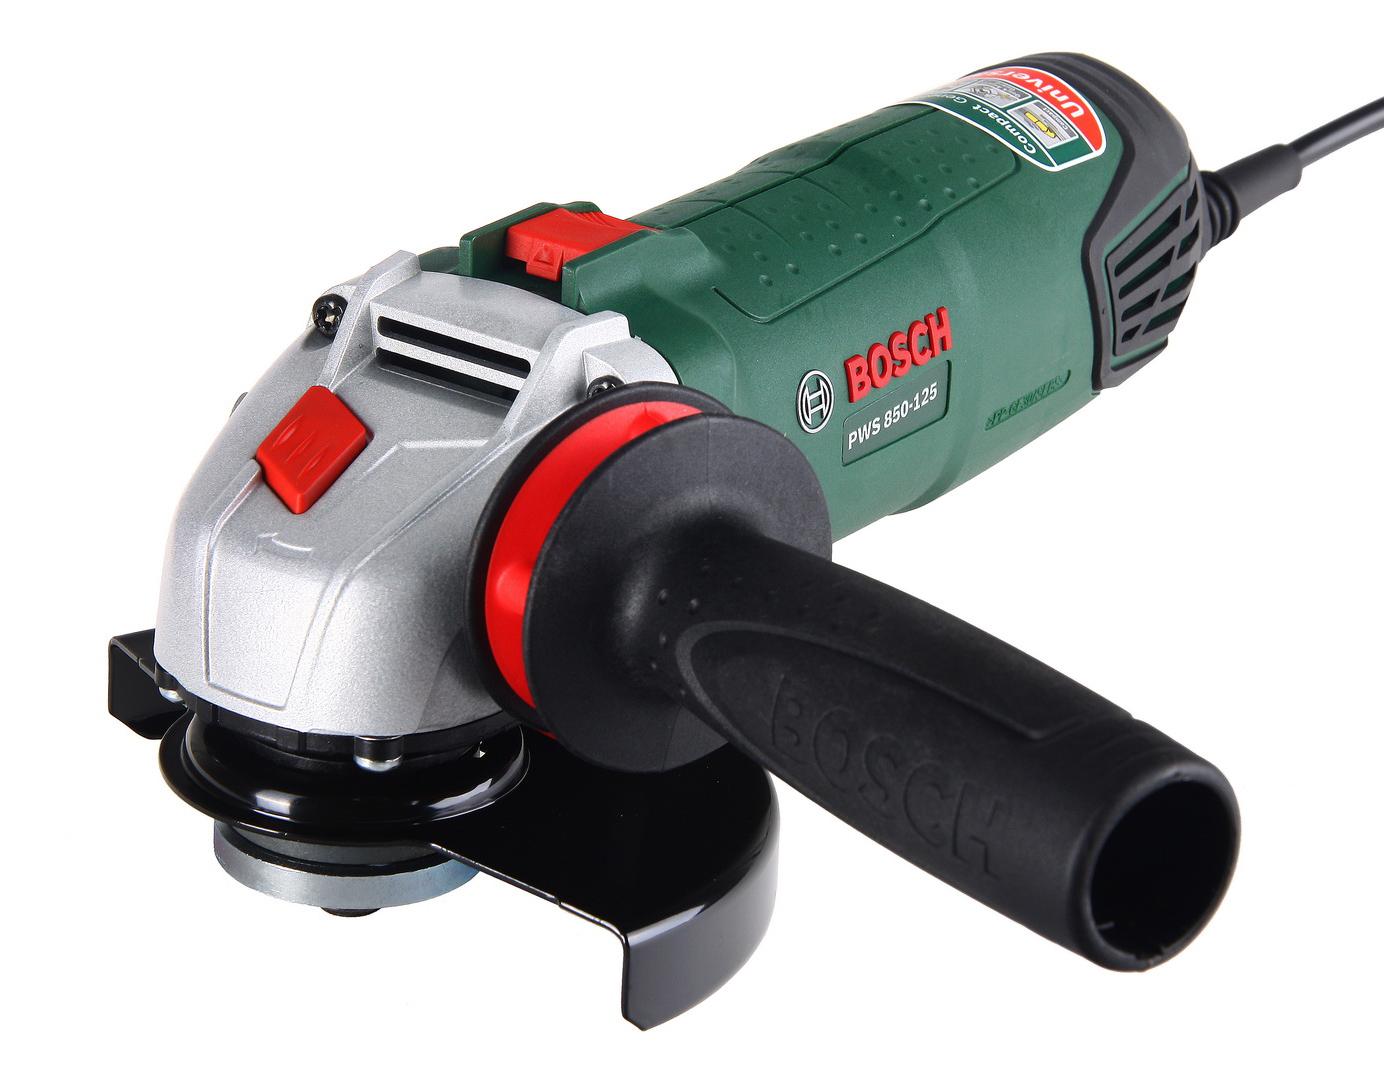 УШМ (болгарка) Bosch Pws 850-125 (0.603.3a2.720) bosch pws 850 125 06033a2704